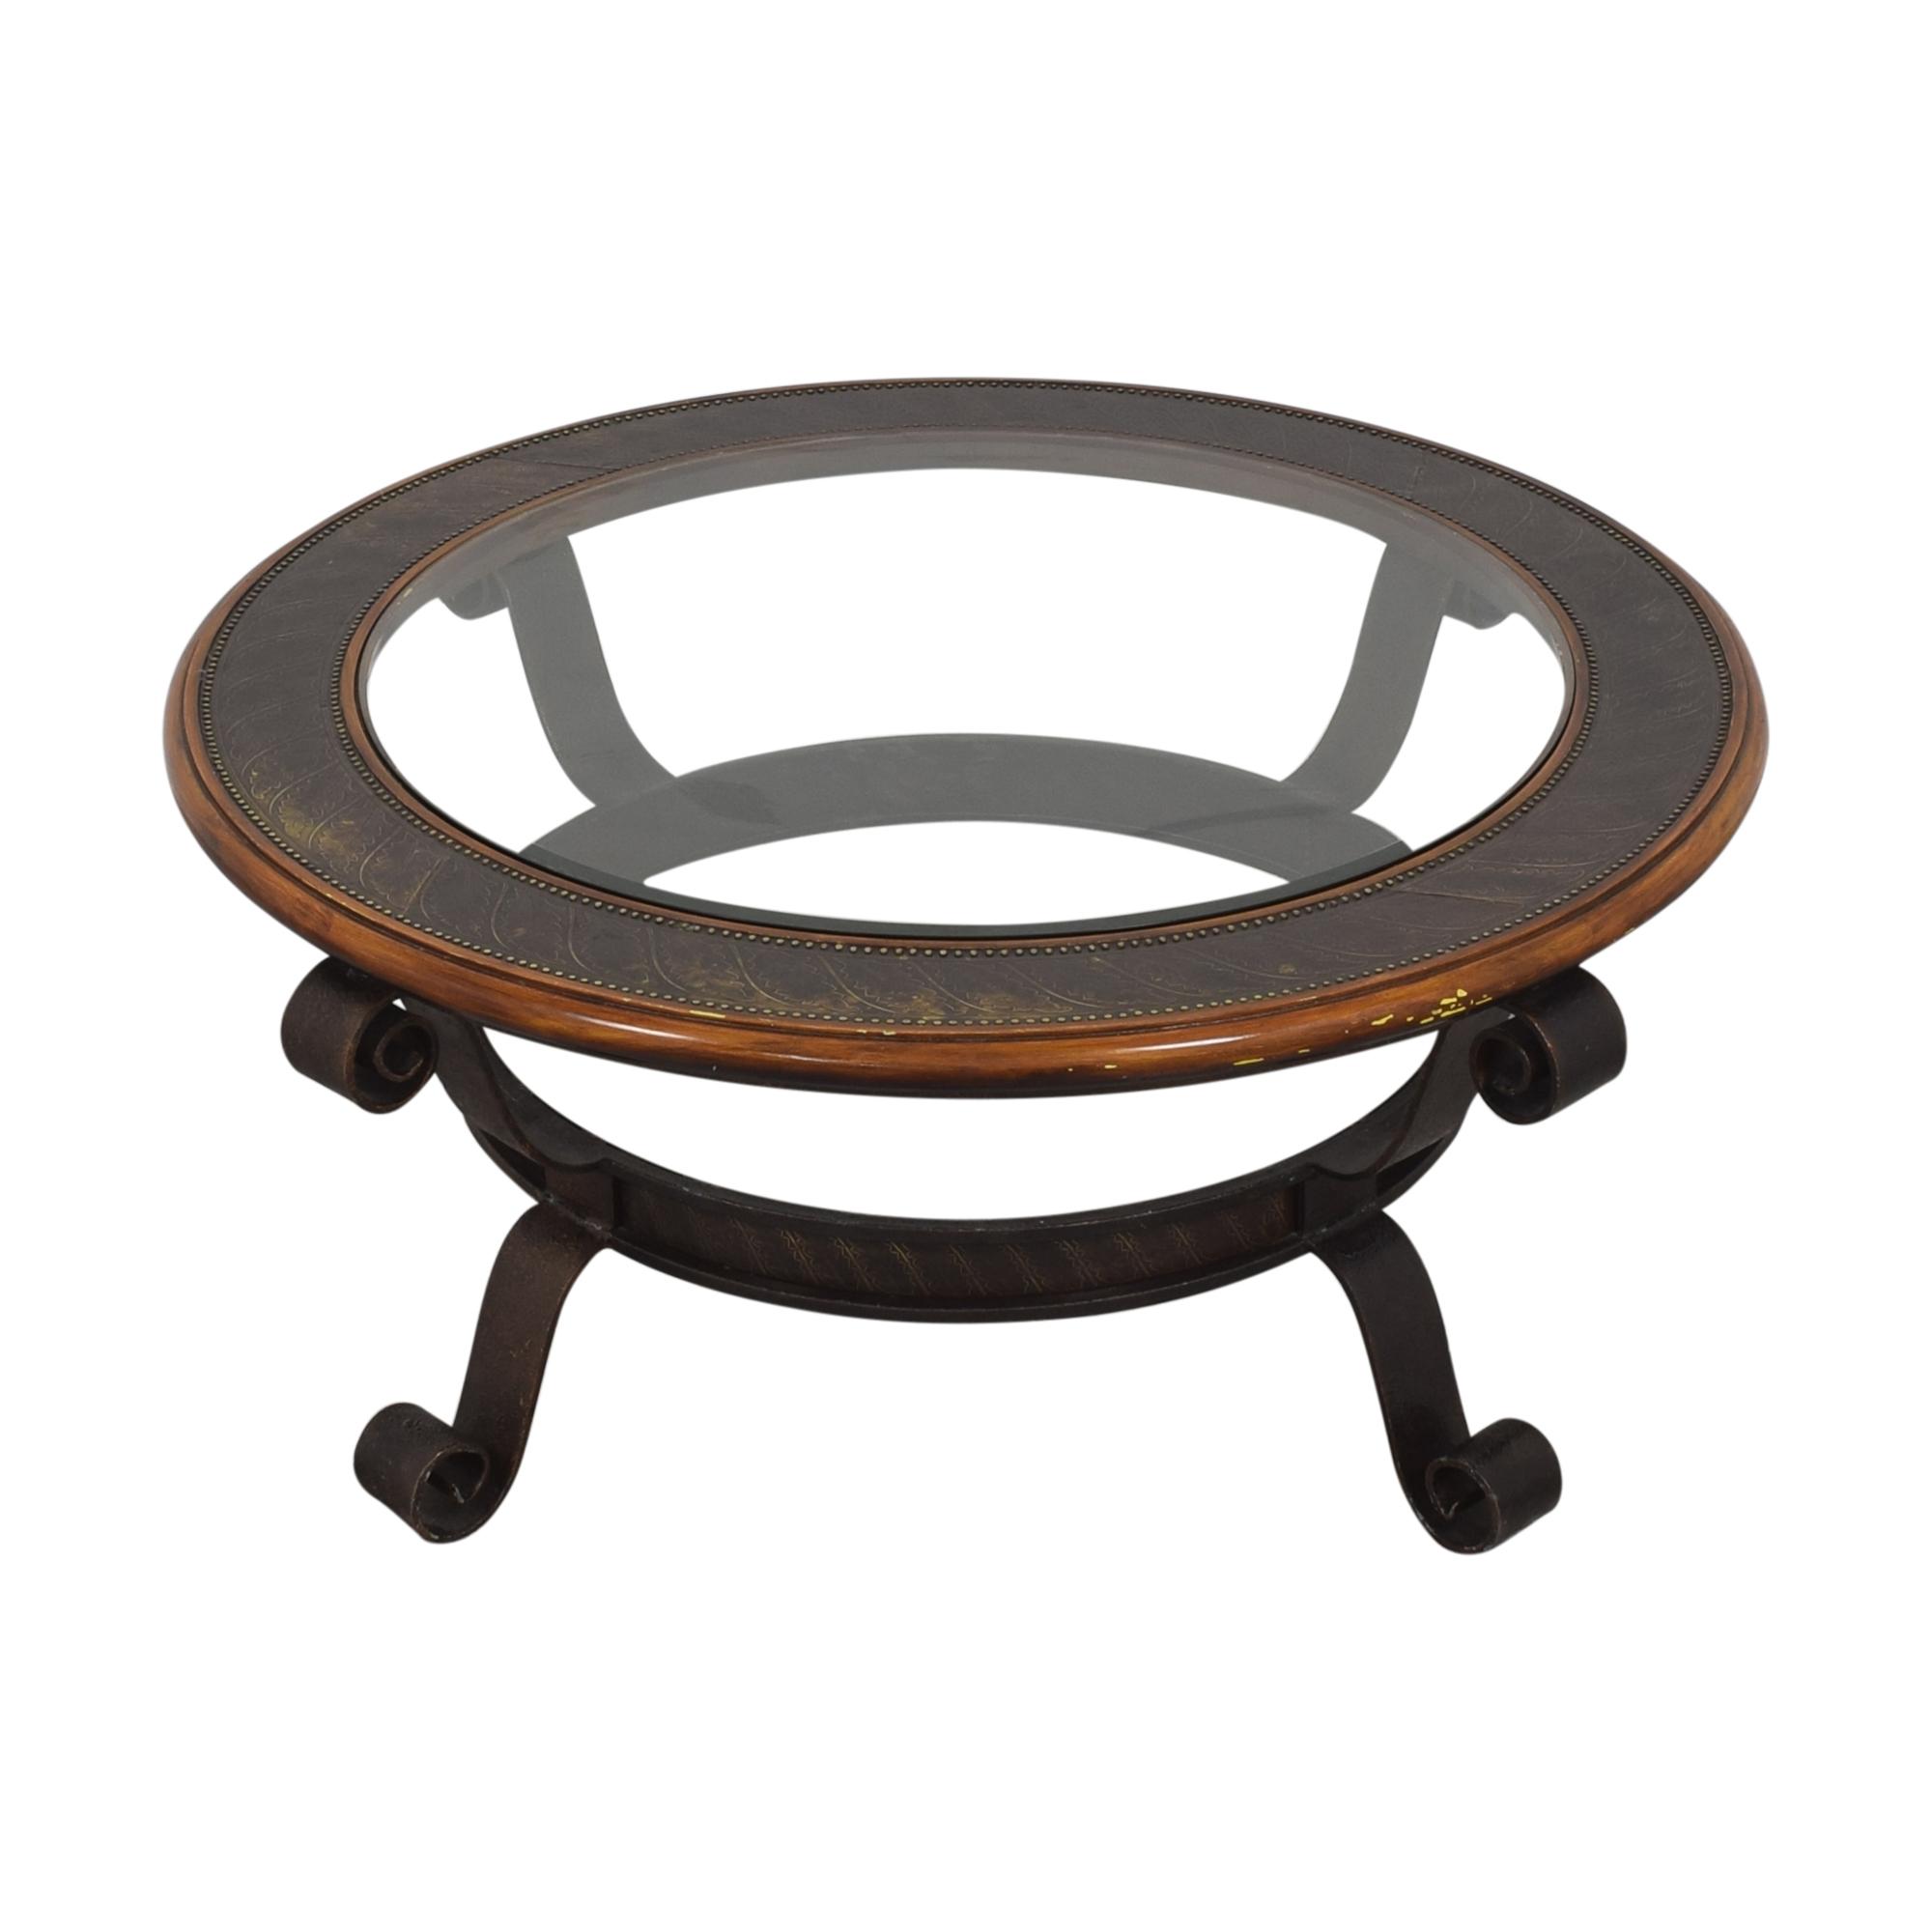 Maitland-Smith Maitland Smith Round Coffee Table used